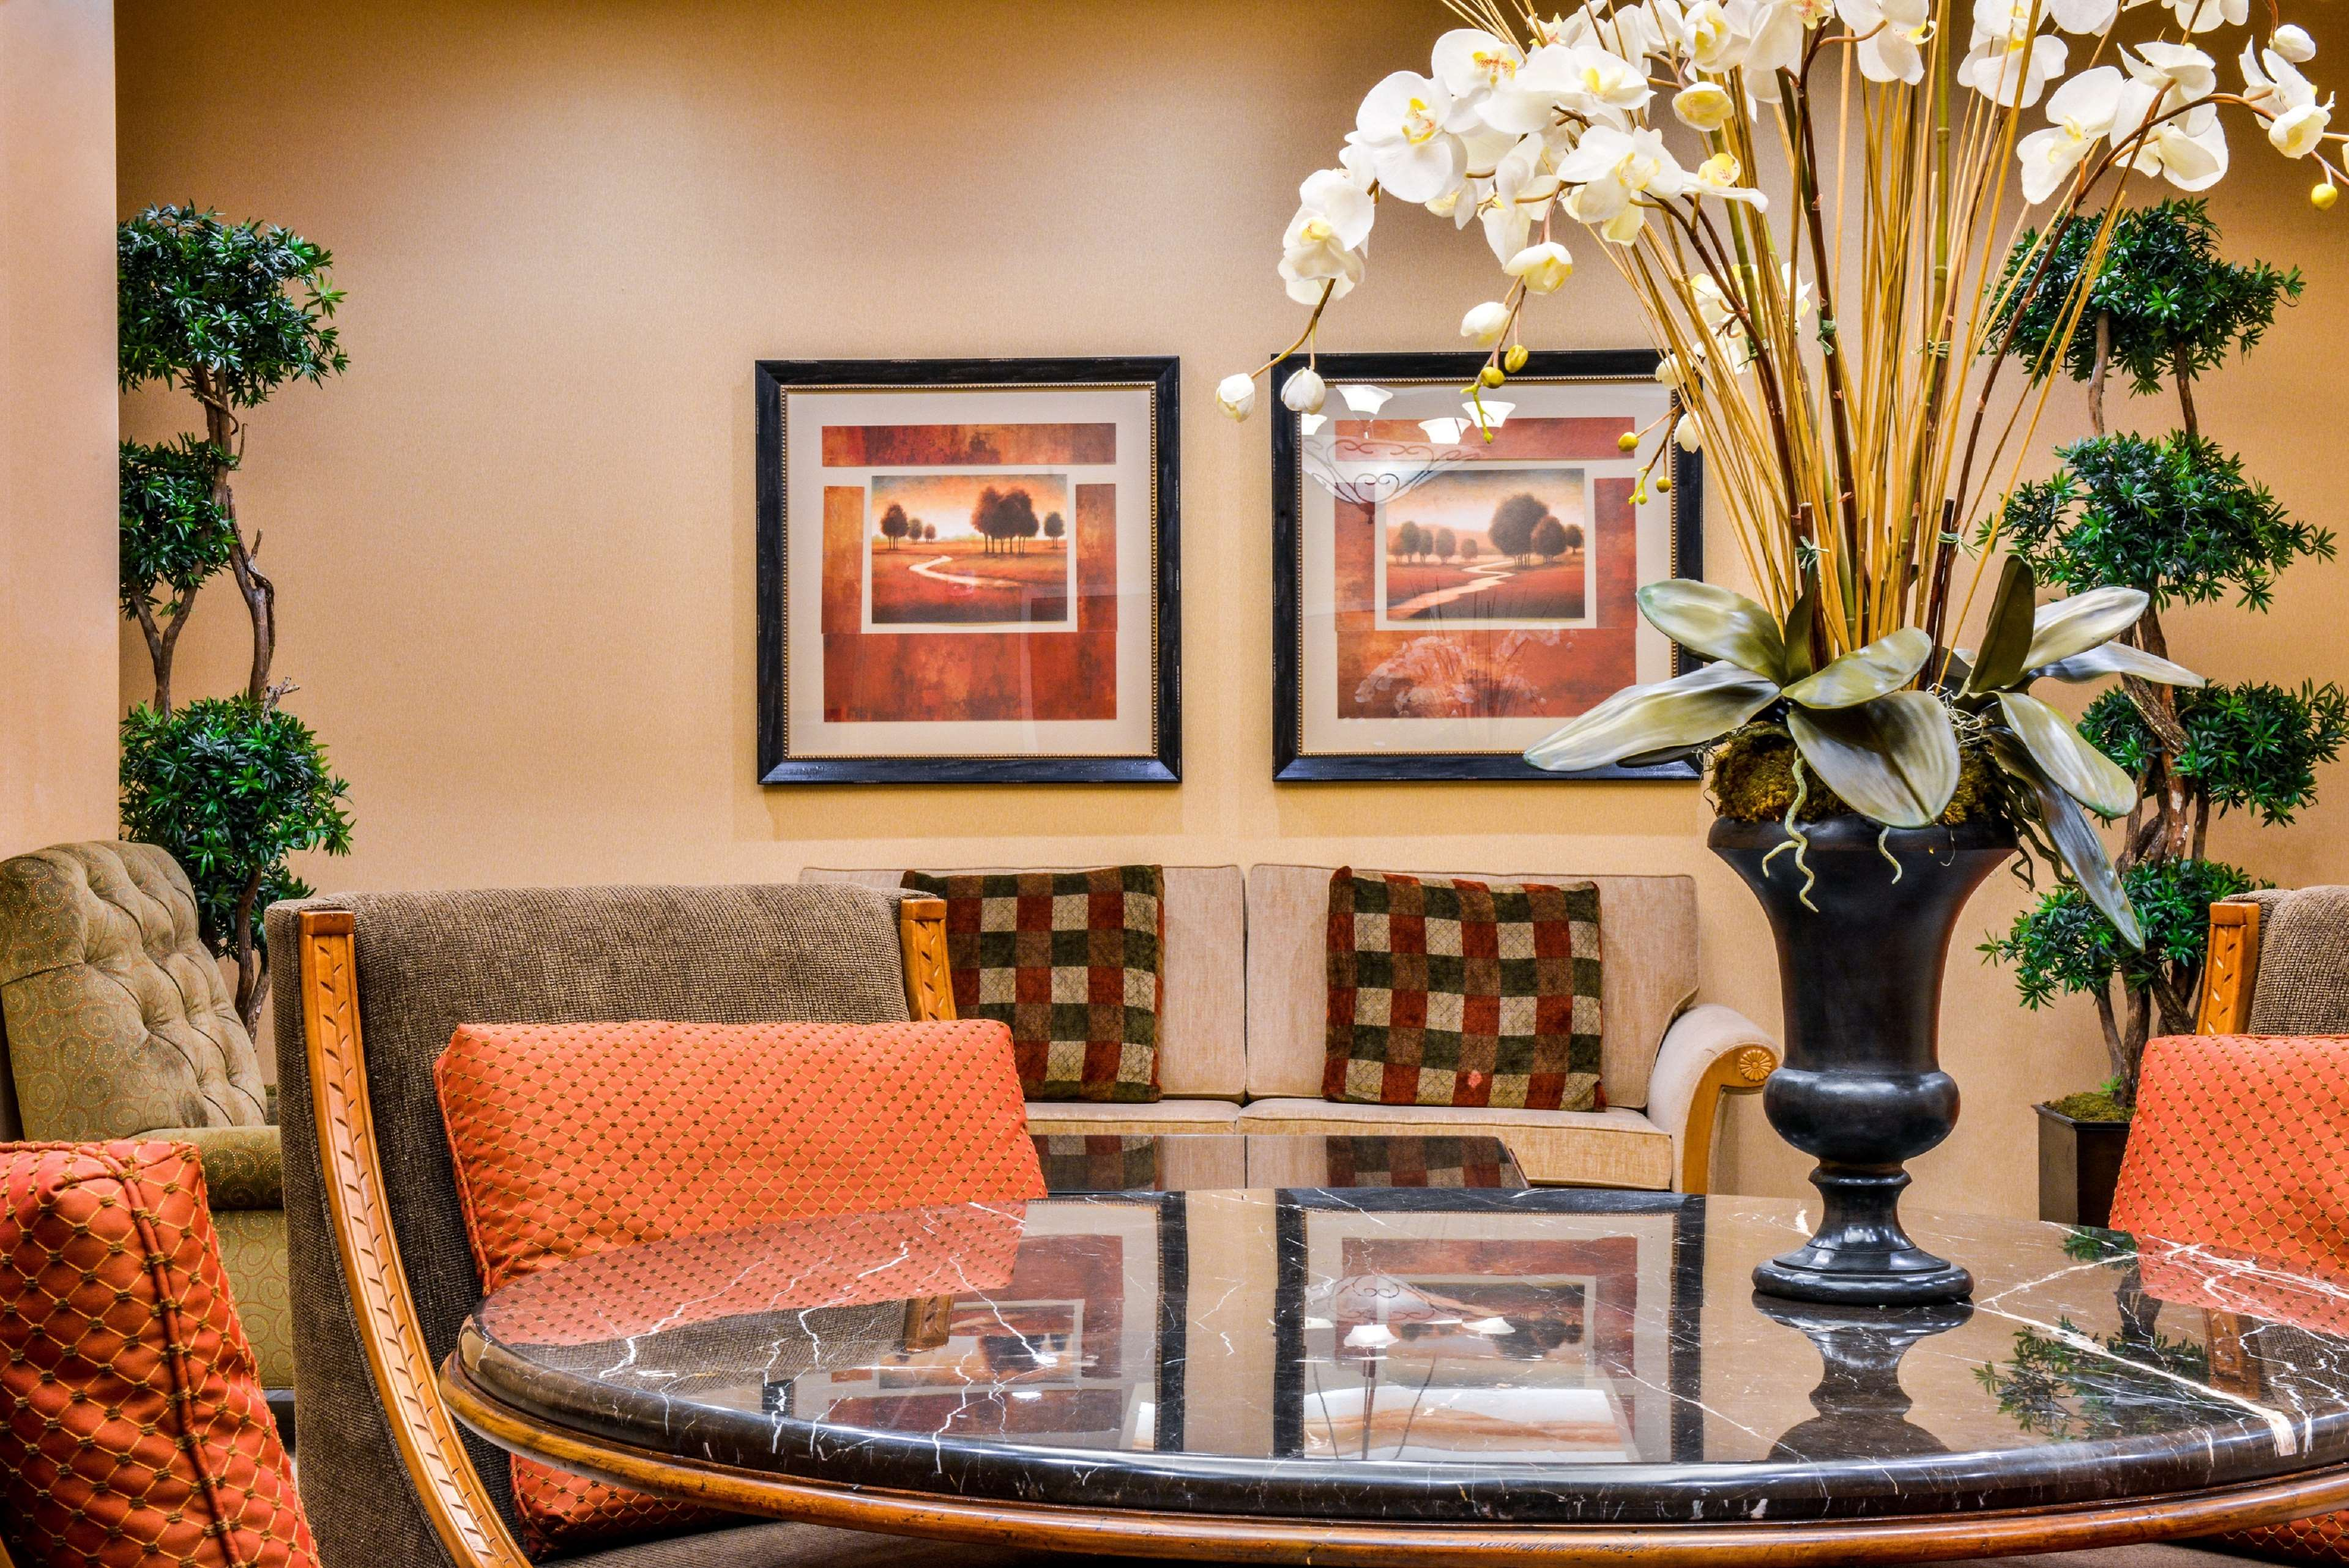 Hampton Inn & Suites Coeur d' Alene image 5